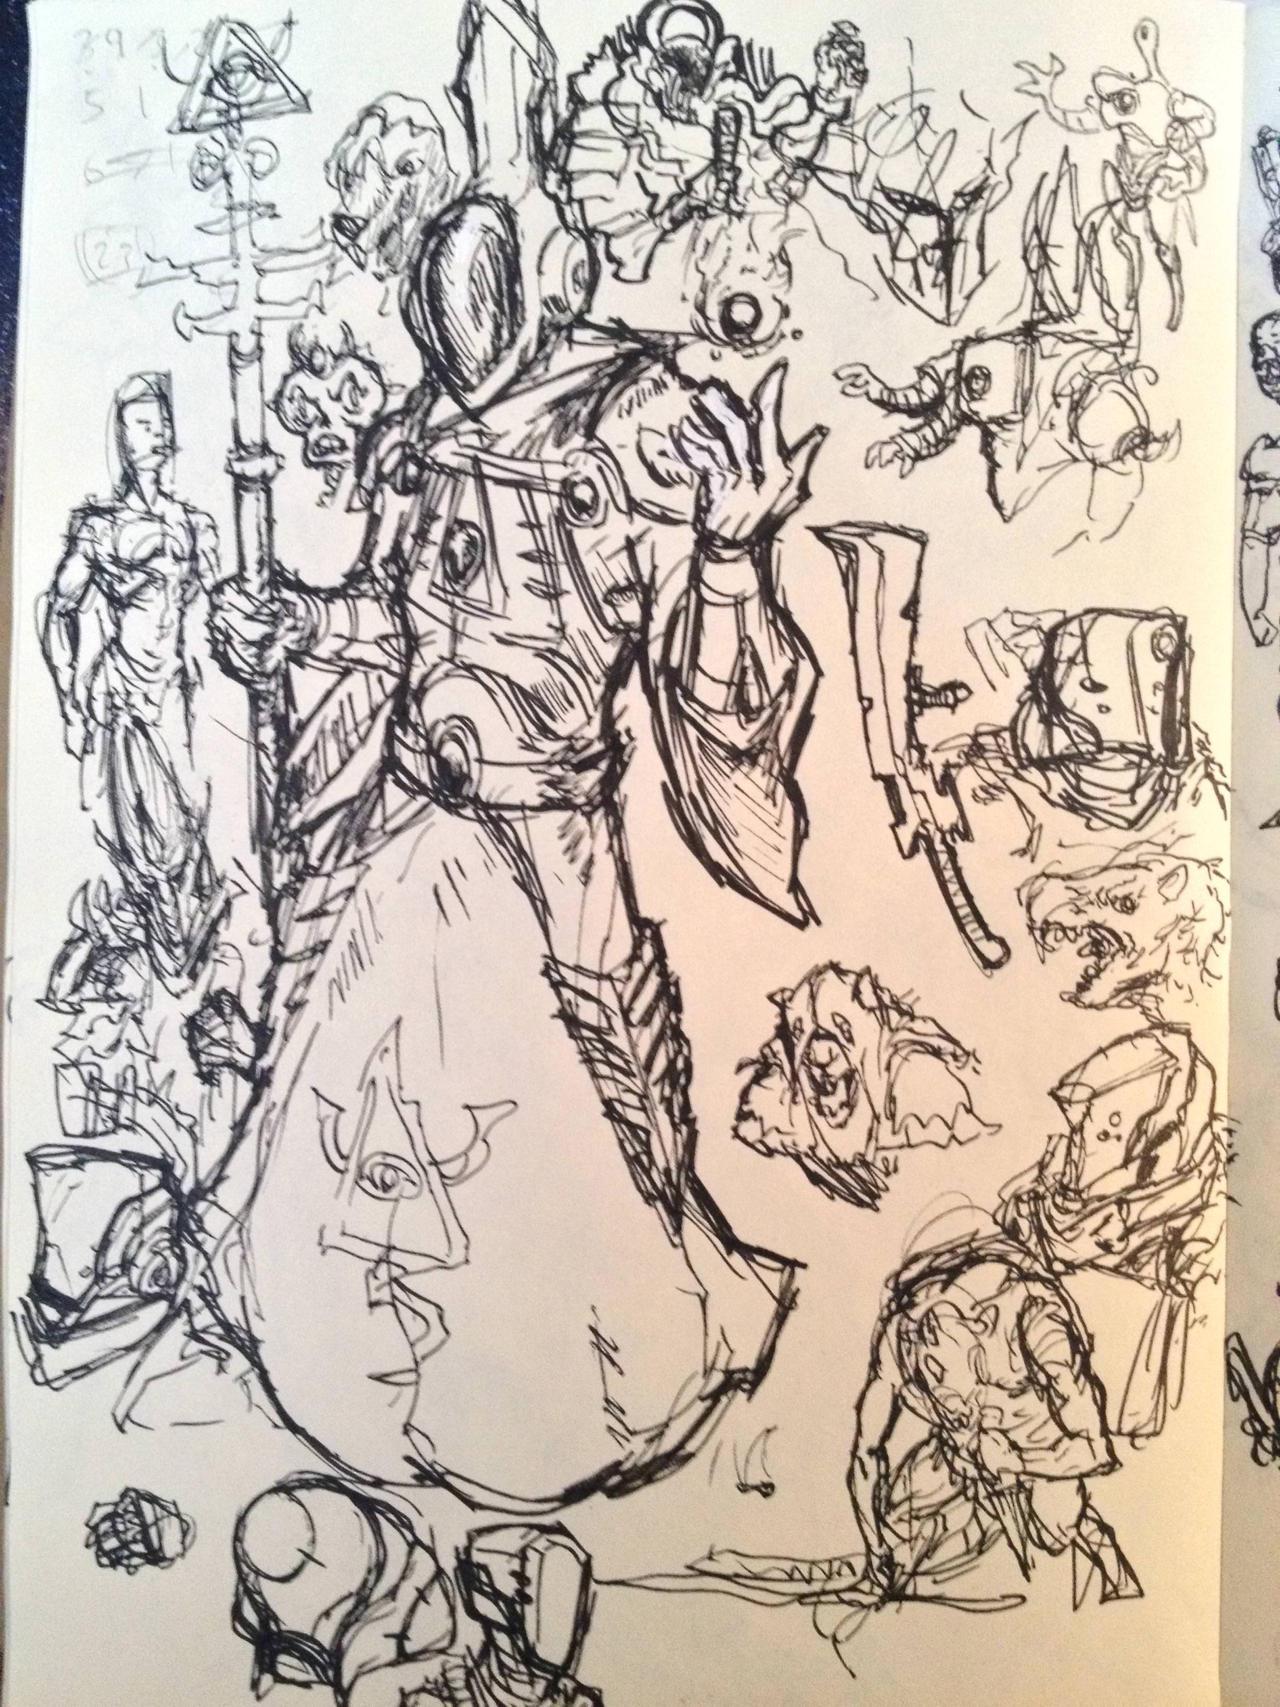 Random Sketch dump by KidneyShake